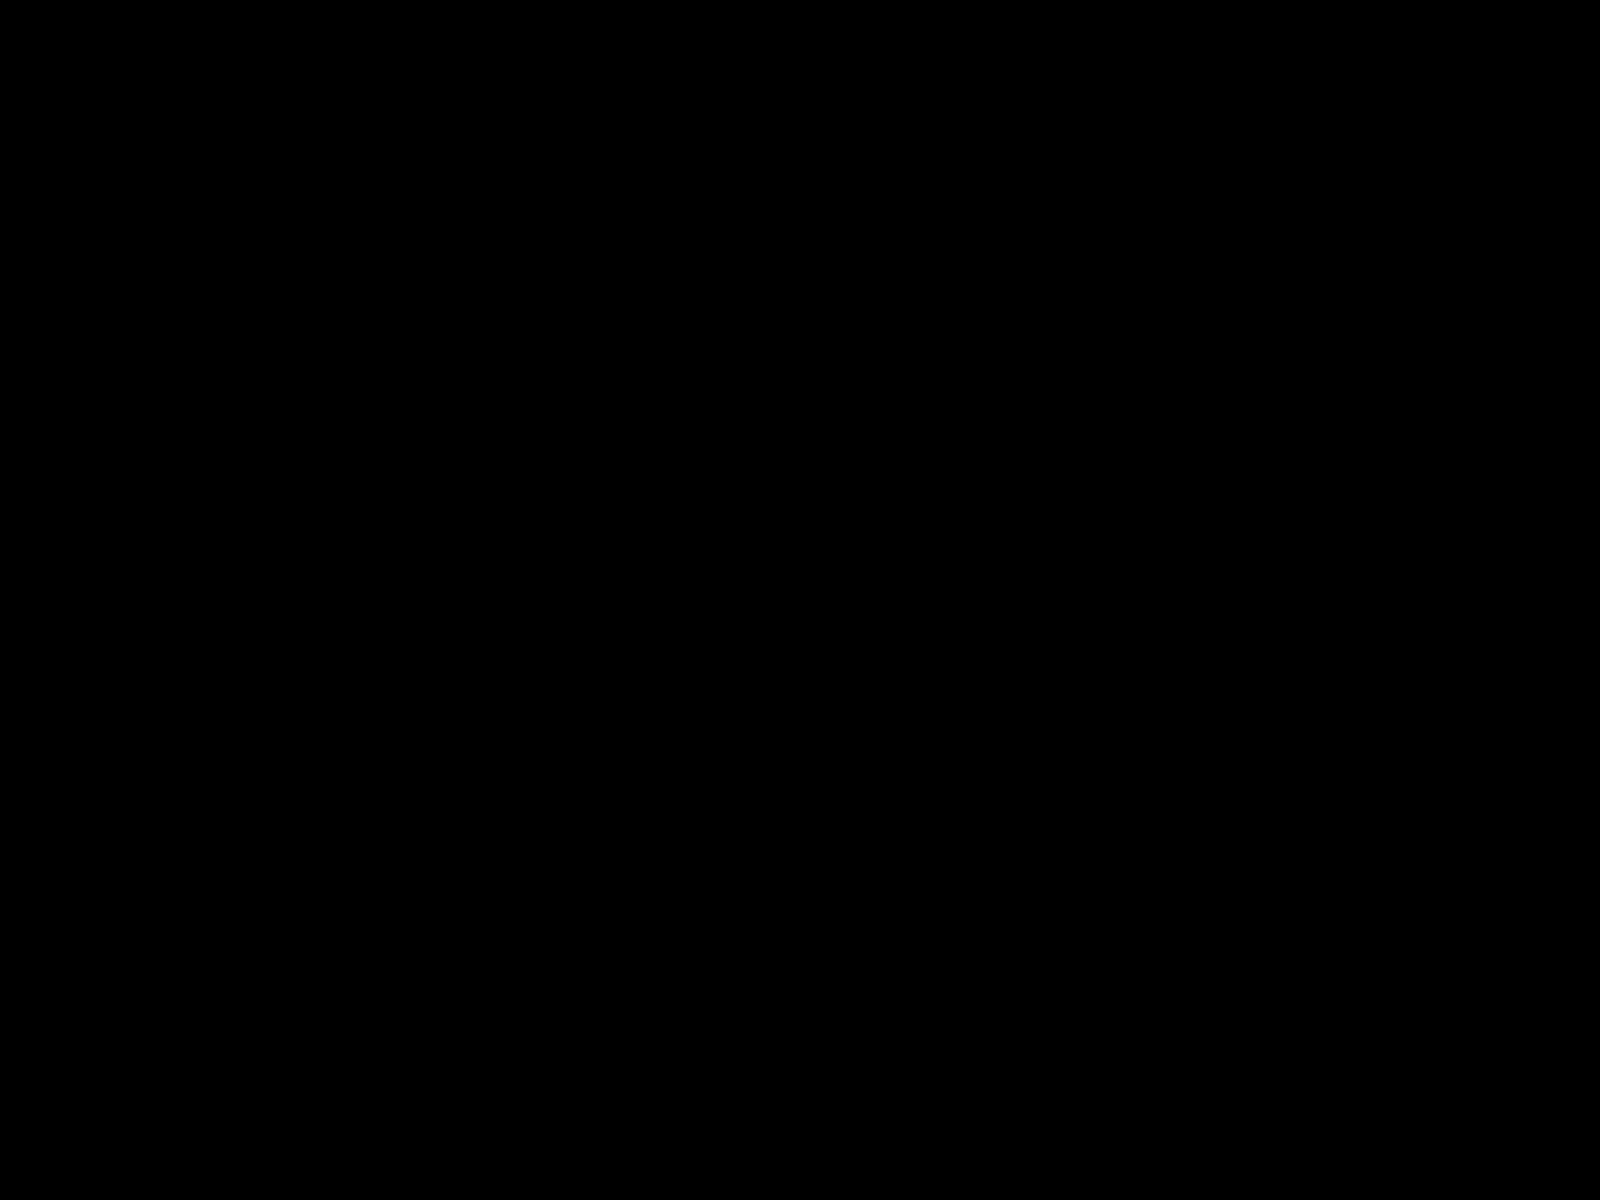 Digital Grunge Black Frame Transparent Overlay Photo Effect Old Abstract Photography Art PNG Download Set 2